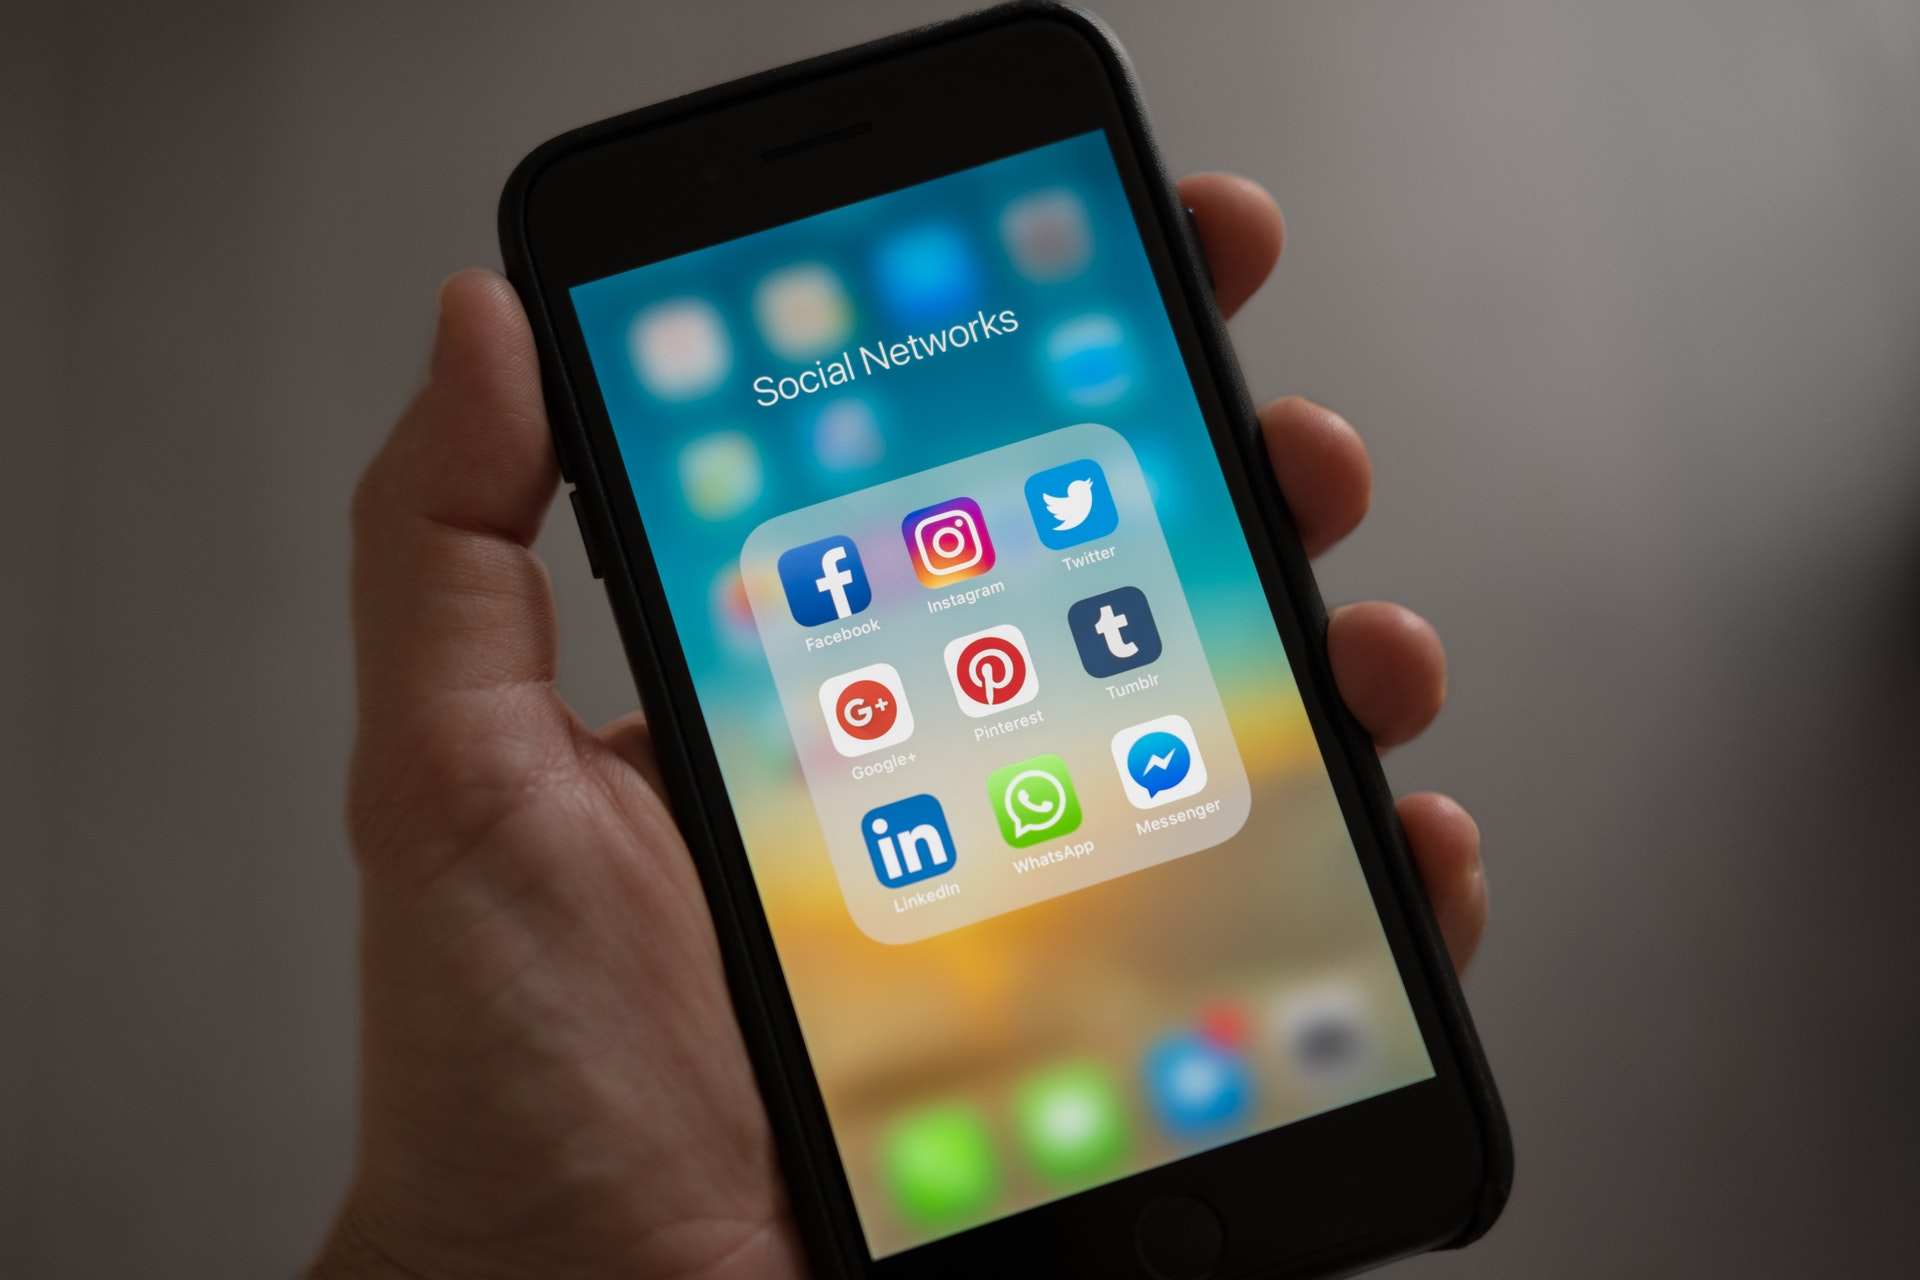 foto met smartphone en social media apps